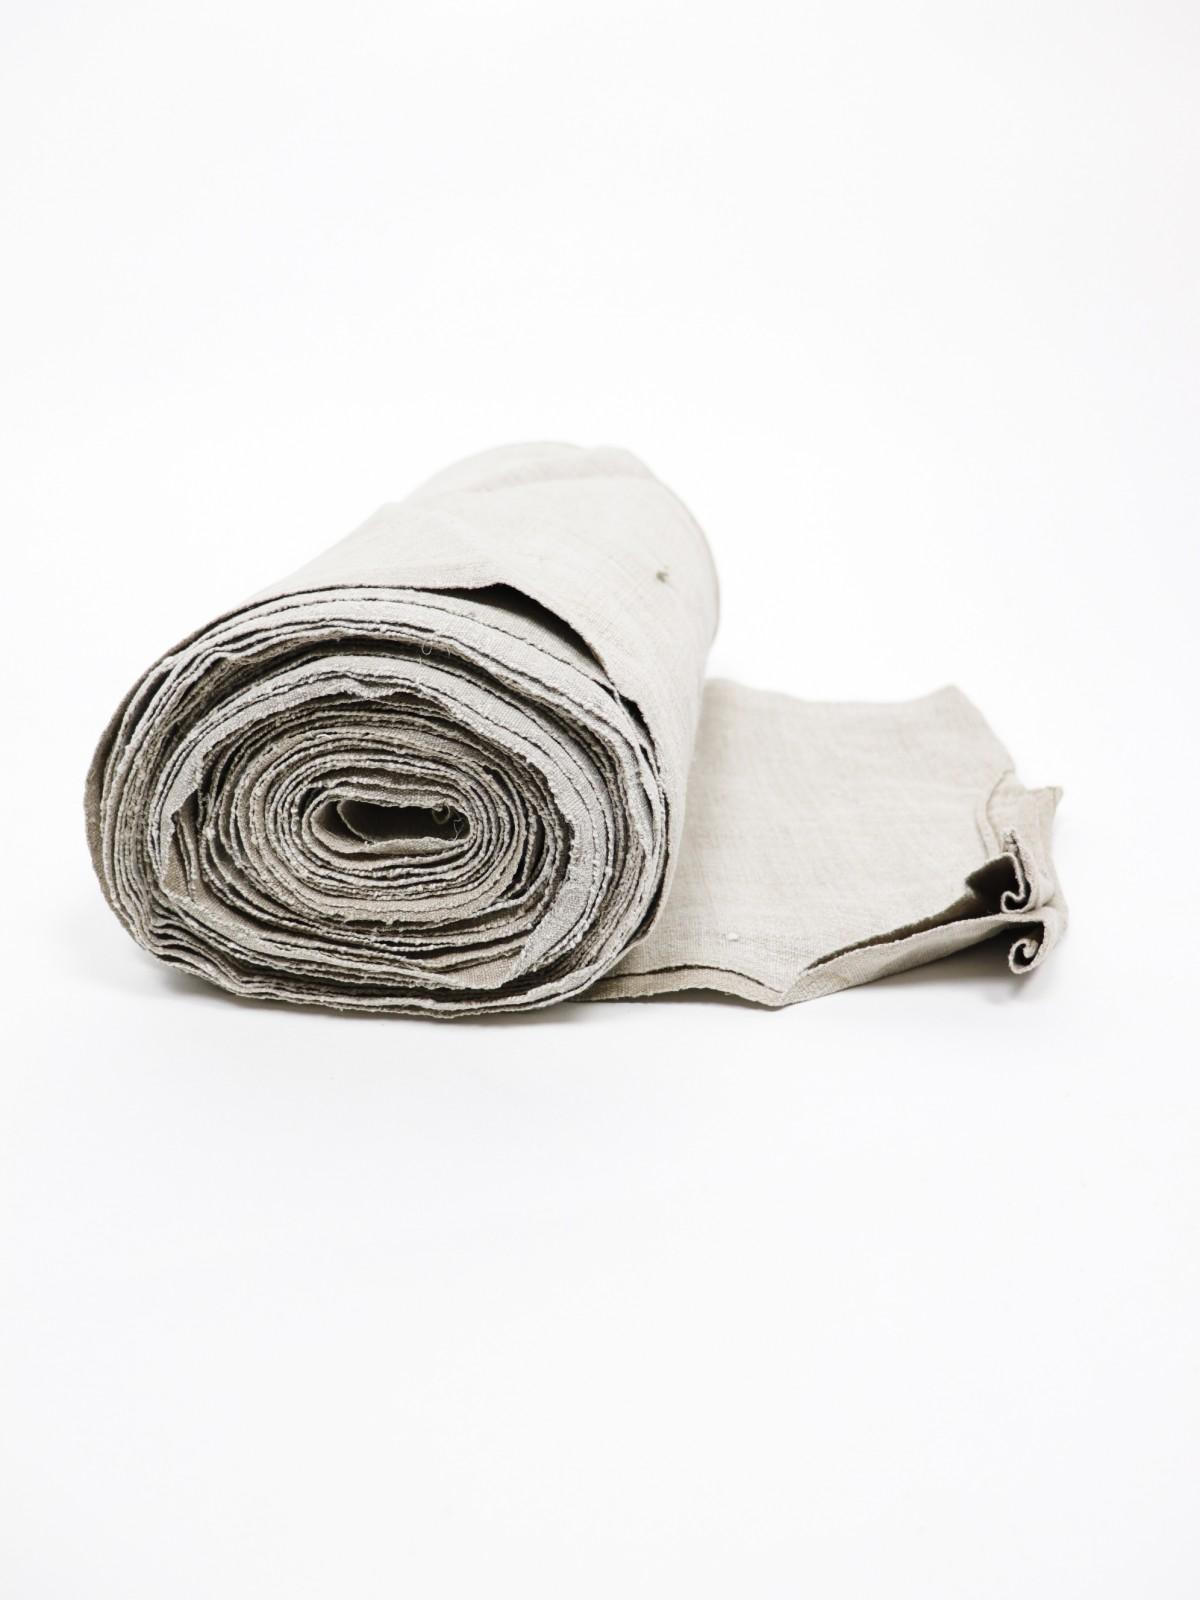 Ukraine, Linen fabric, early1900's